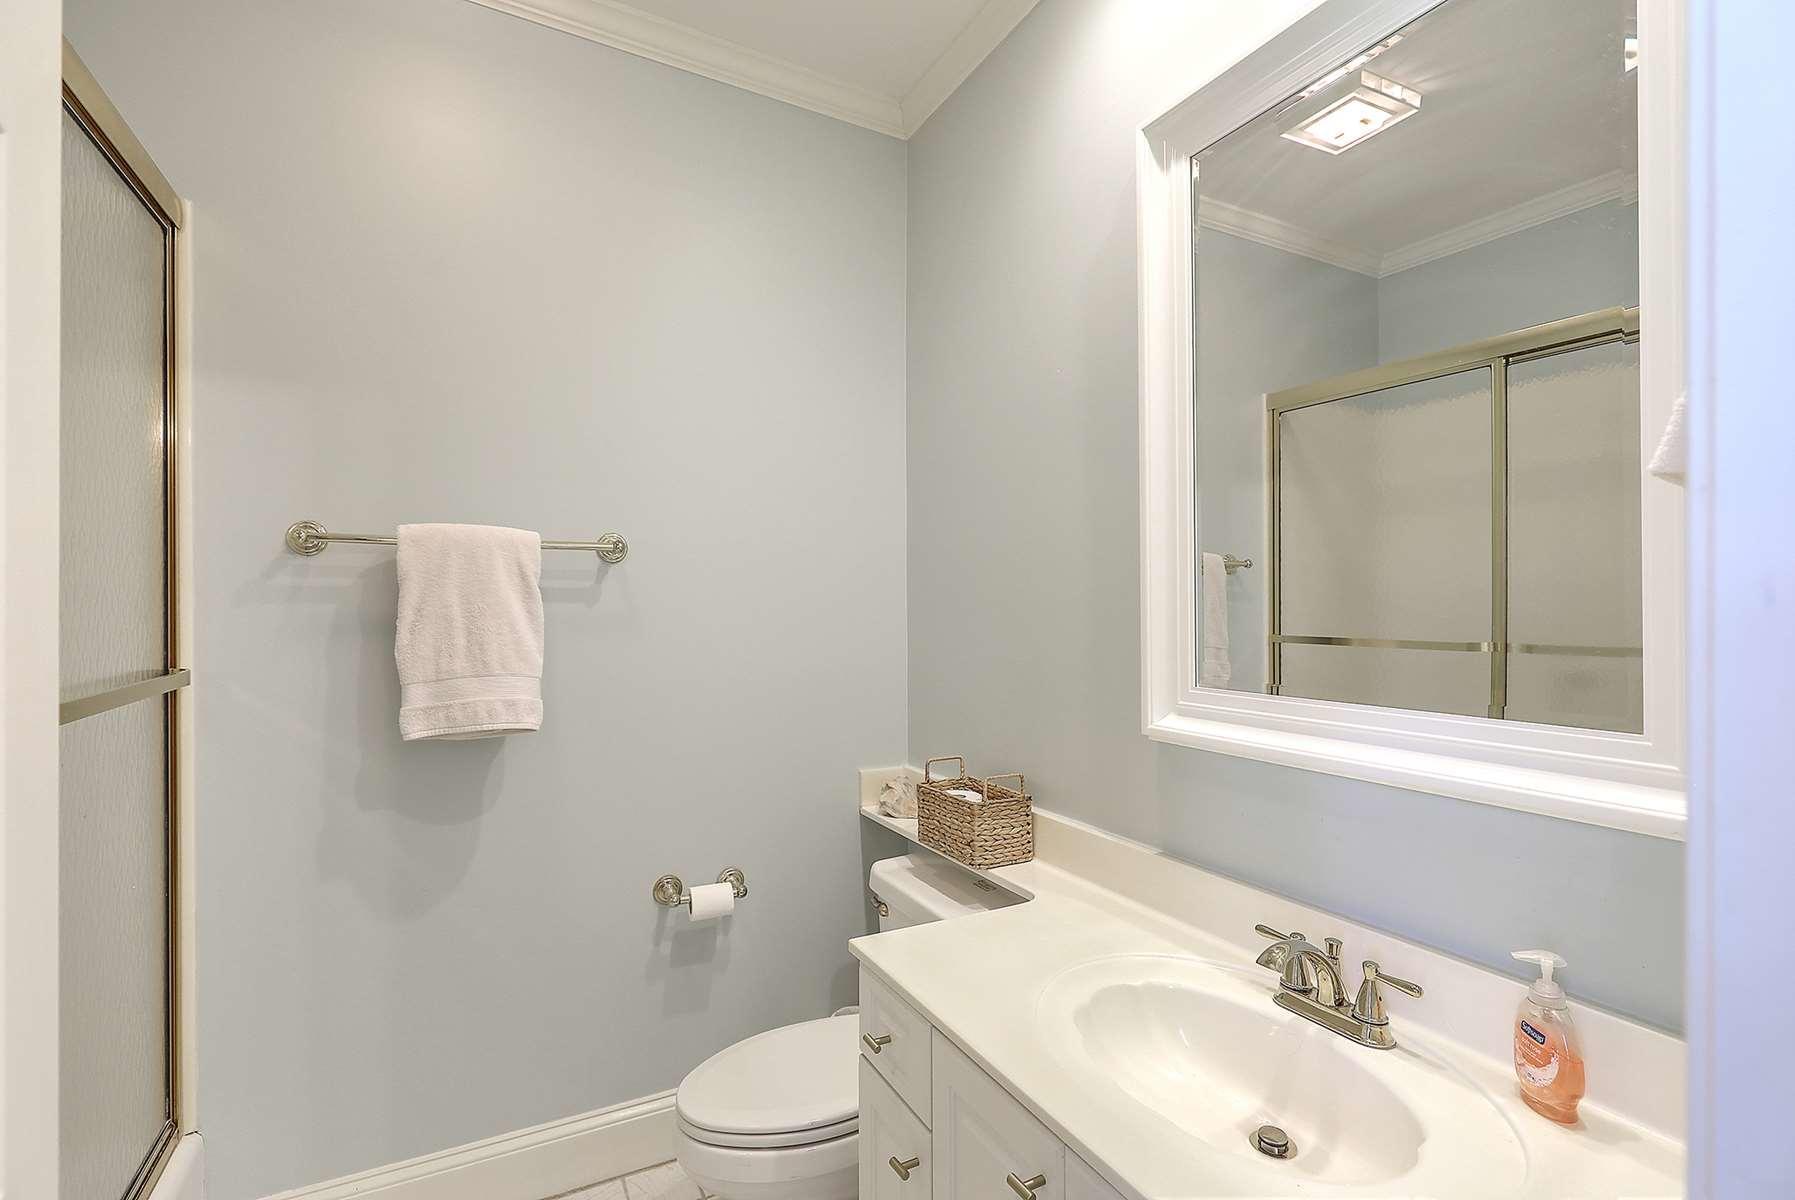 Dunes West Homes For Sale - 2961 Pignatelli, Mount Pleasant, SC - 46